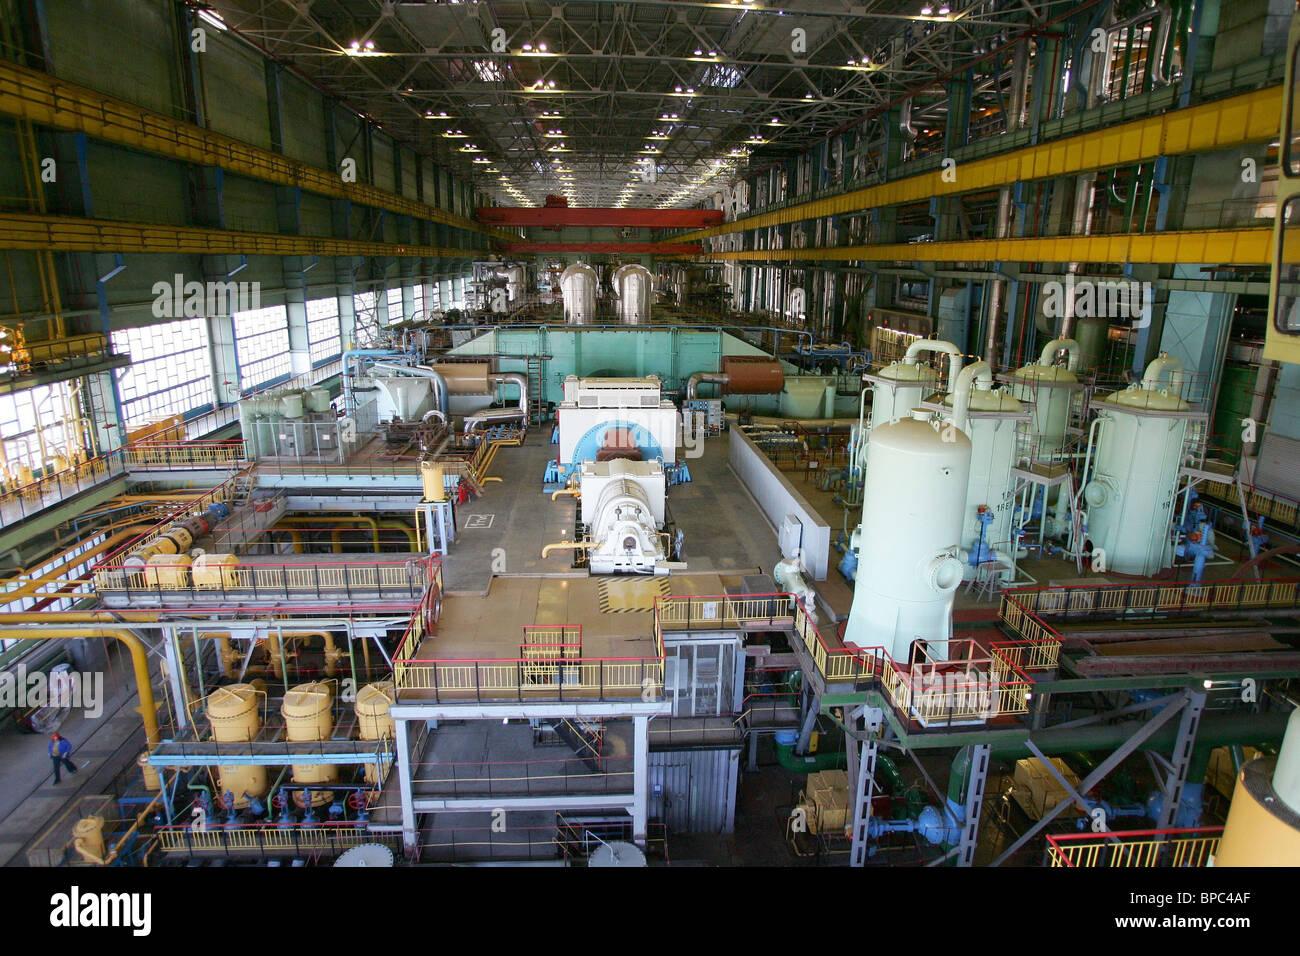 ITAR-TASS 100: TVER REGION, RUSSIA. APRIL 27. At the Kalinin Nuclear Power Plant. (Photo ITAR-TASS / Vladimir Smirnov) - Stock Image